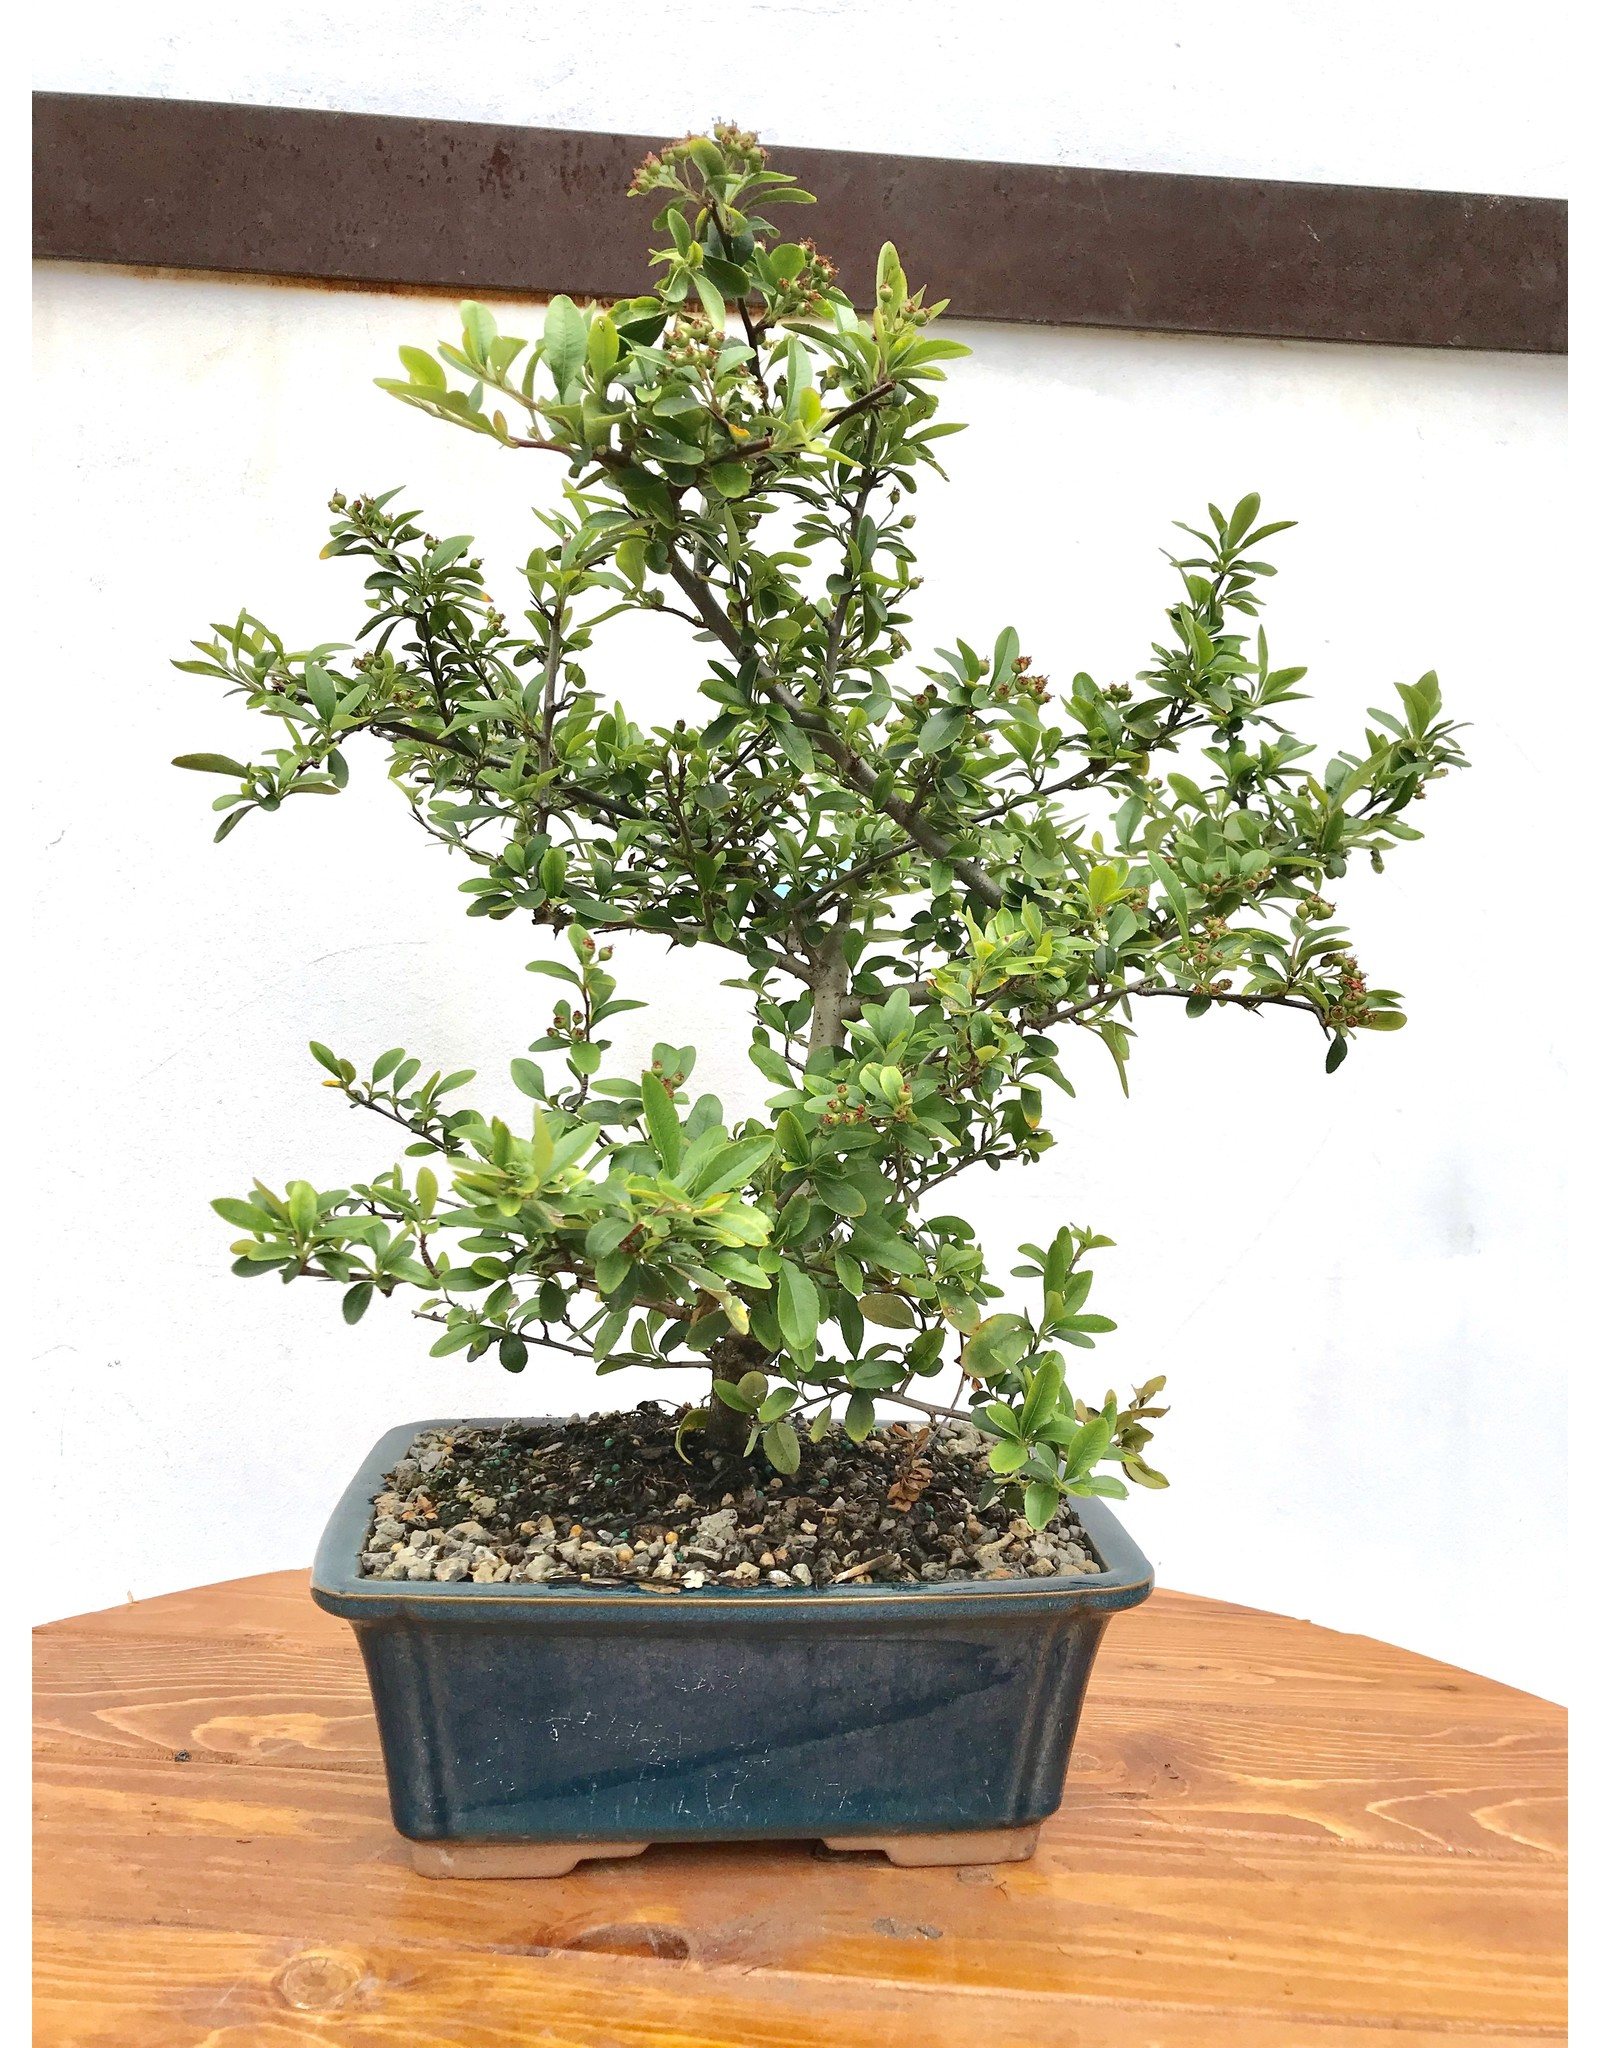 Bonsai, Dwarf Pyracantha - Pyracantha 'Red Cushion'